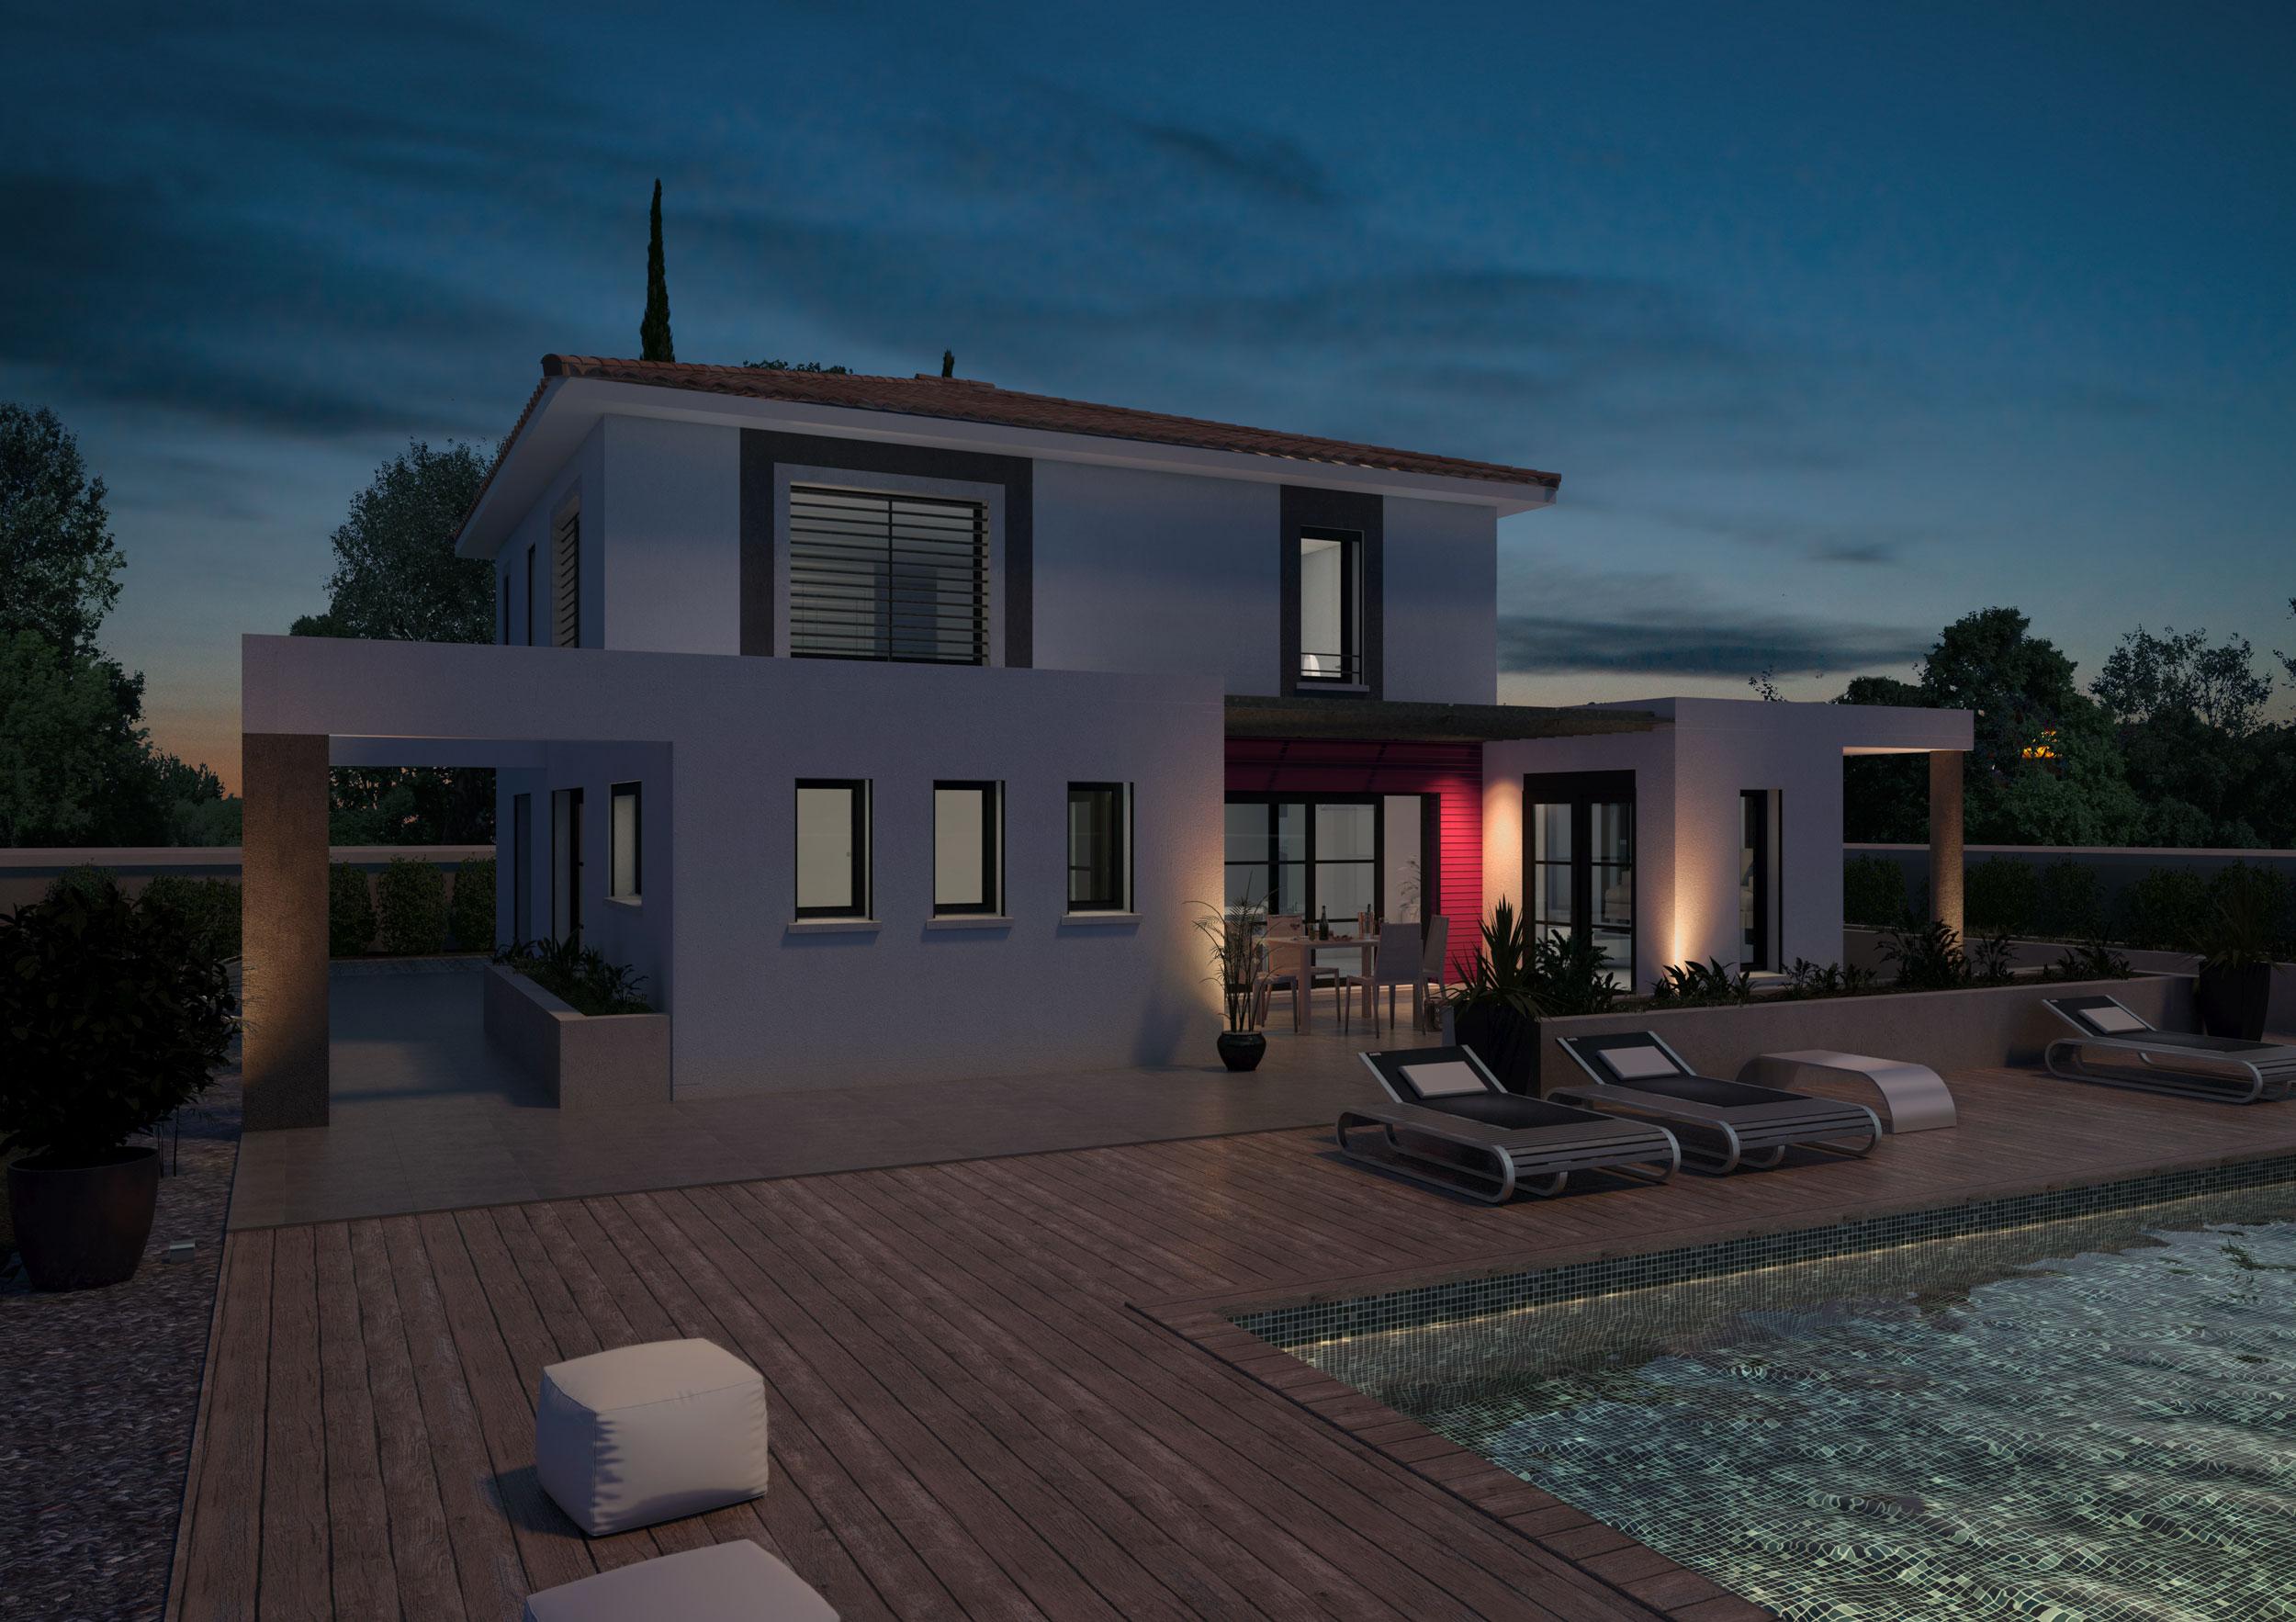 Image 3d Maison individuelle type Miami